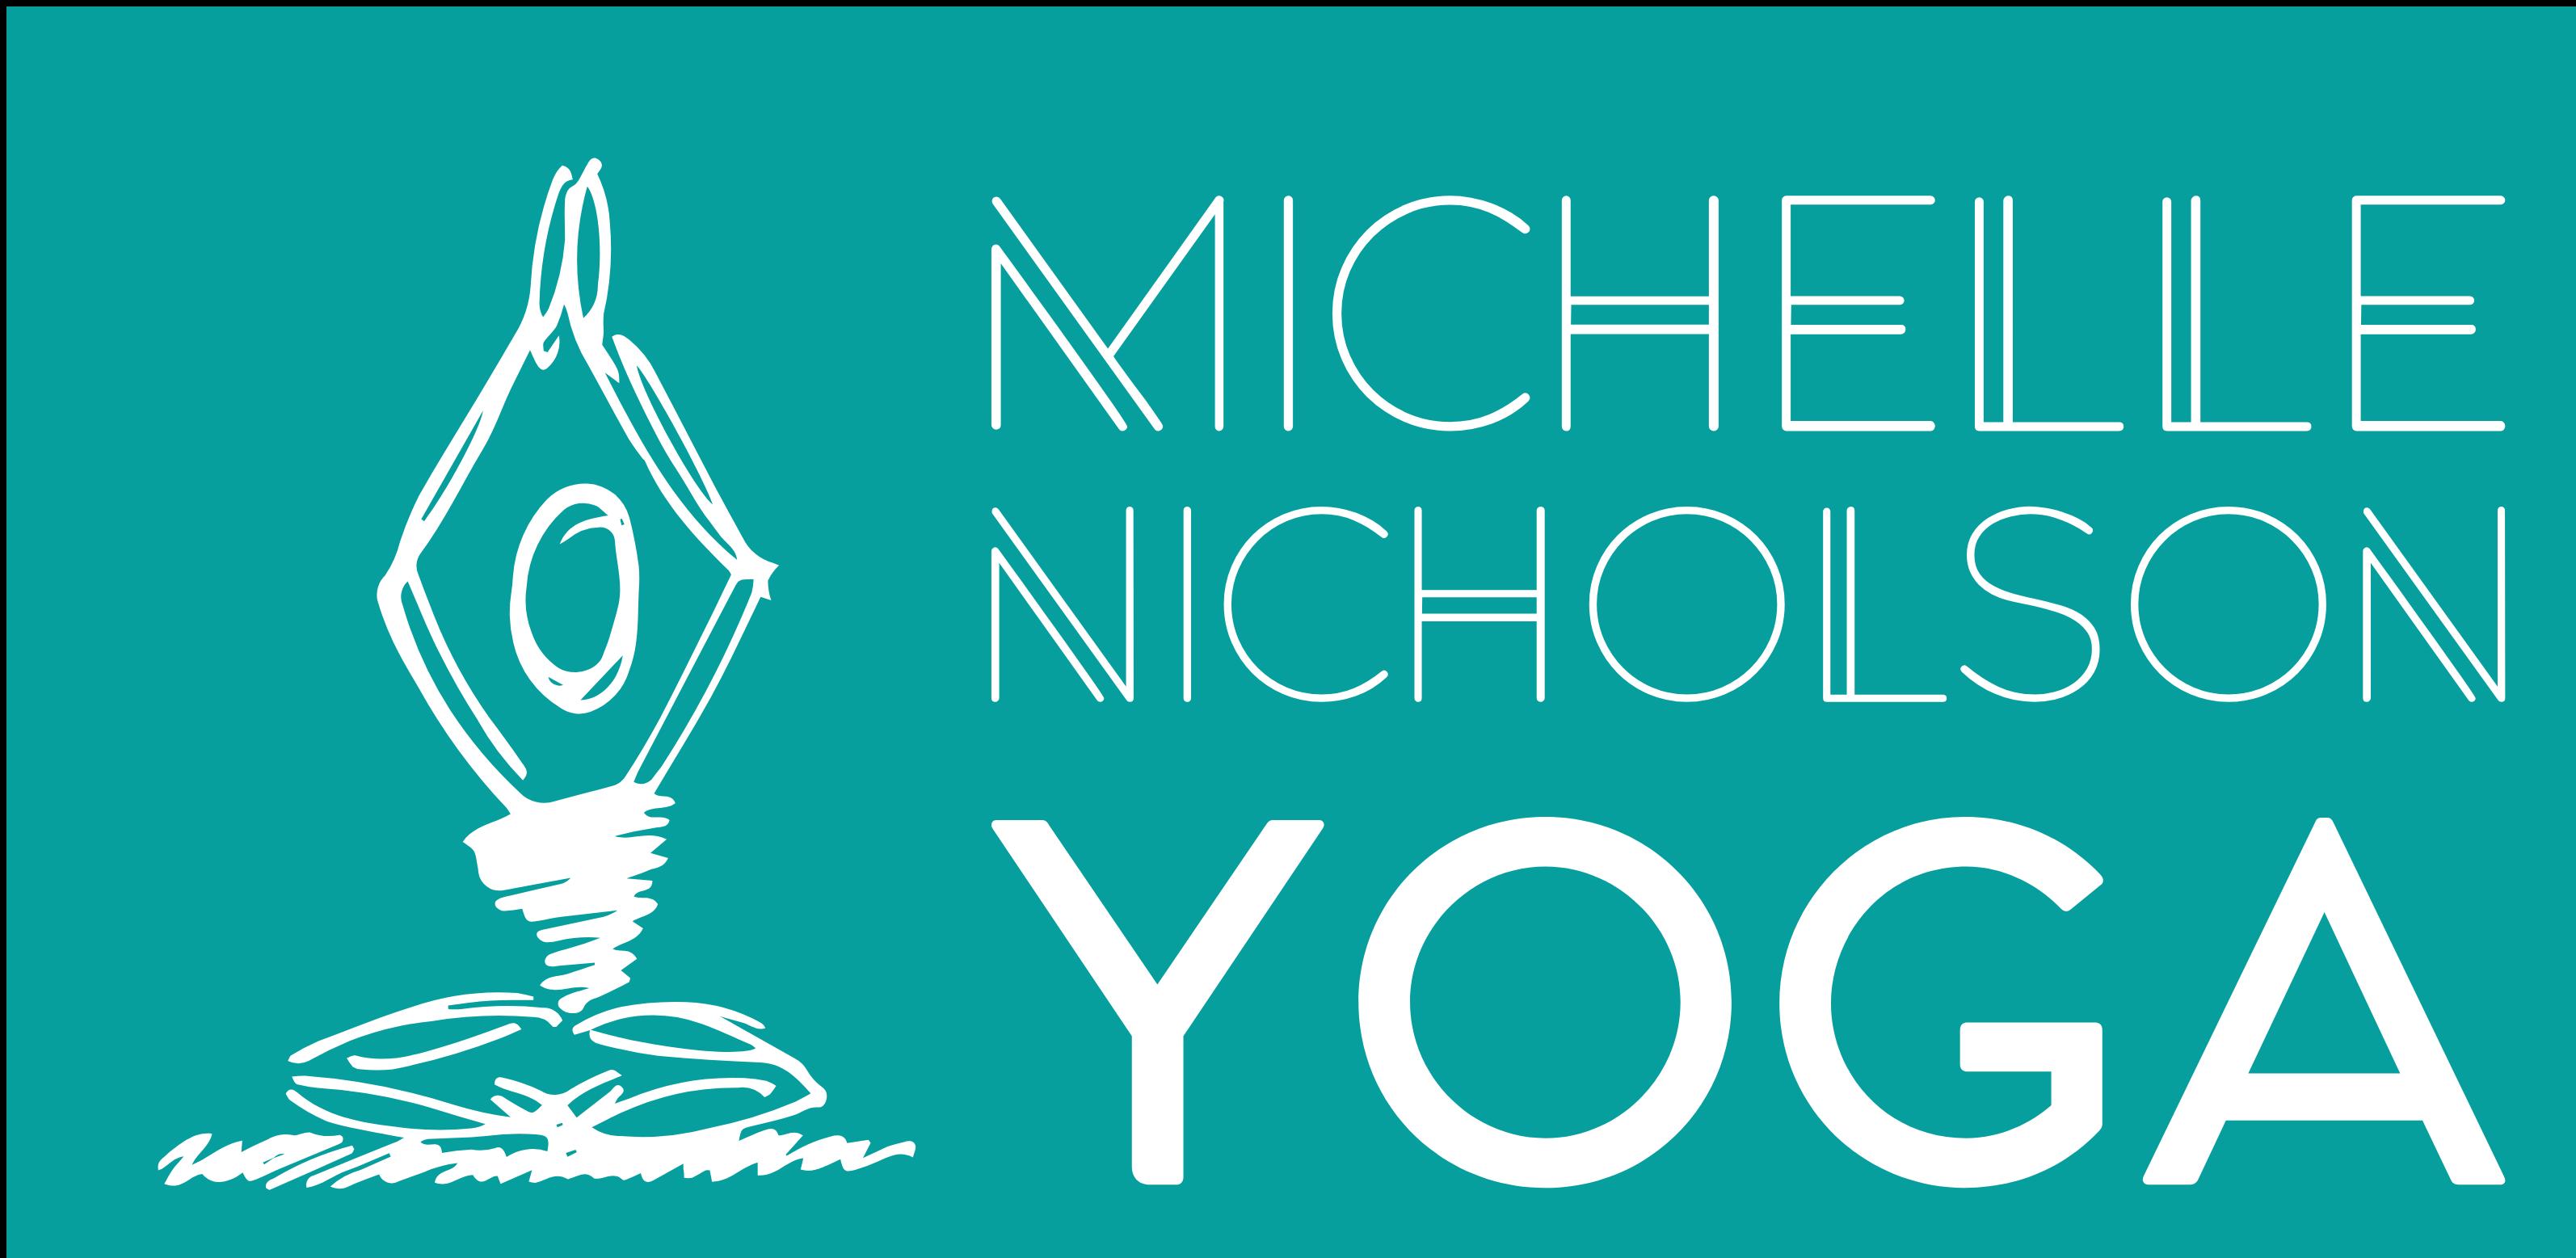 Michelle Nicholson Yoga Logo